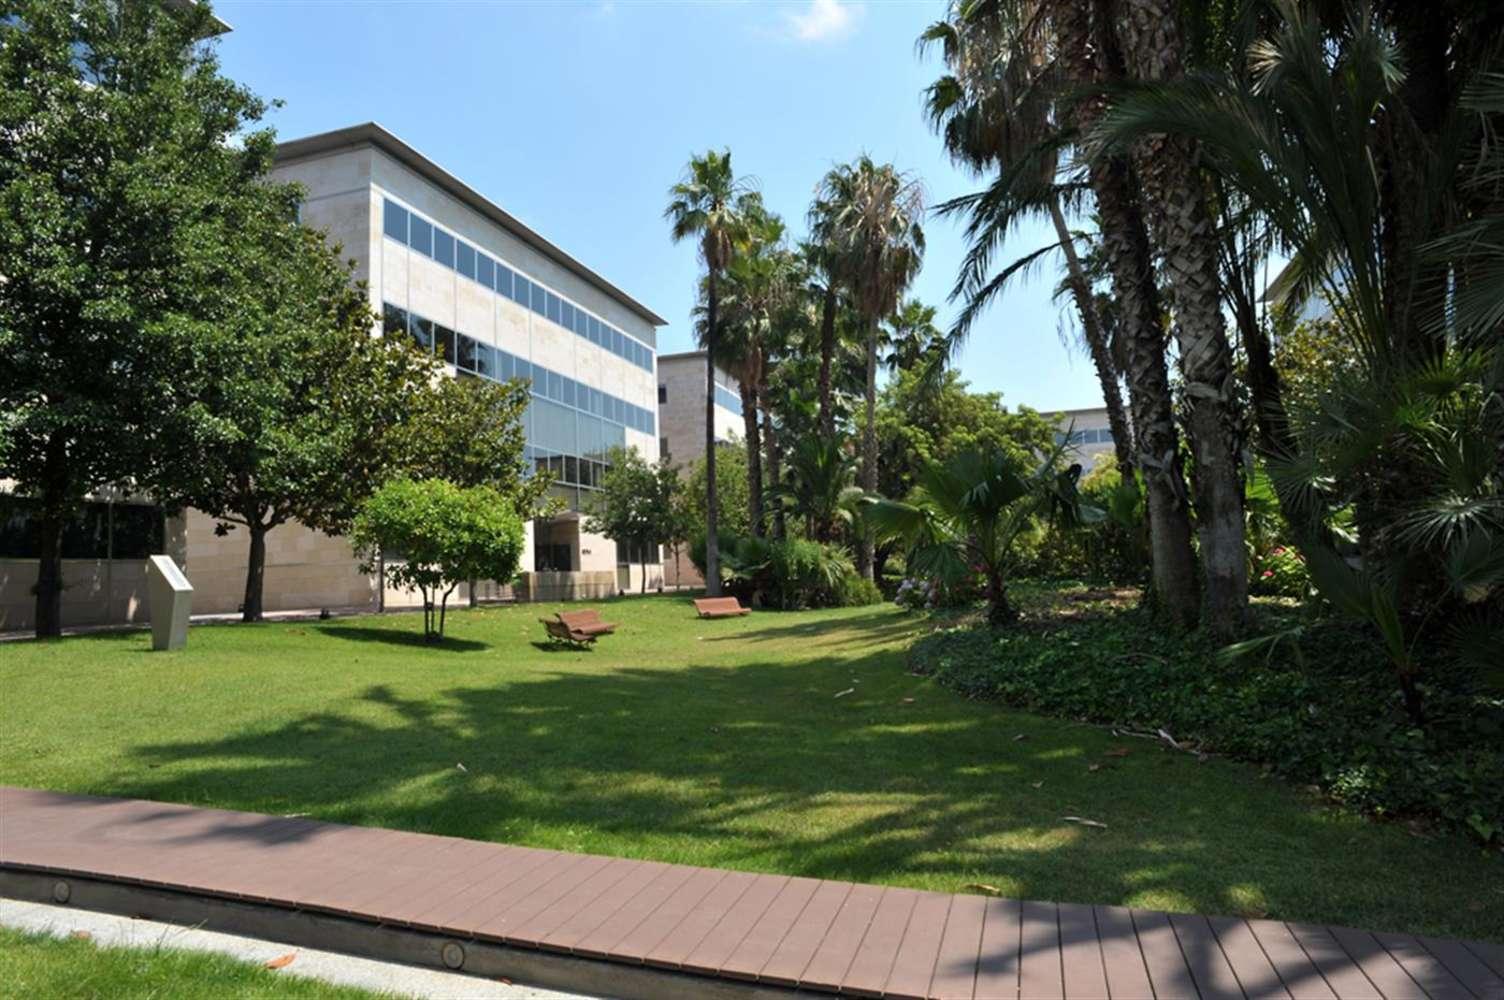 Oficina Cornellà de llobregat, 08940 - CITY PARC - EDIFICIO VIENA - 11790